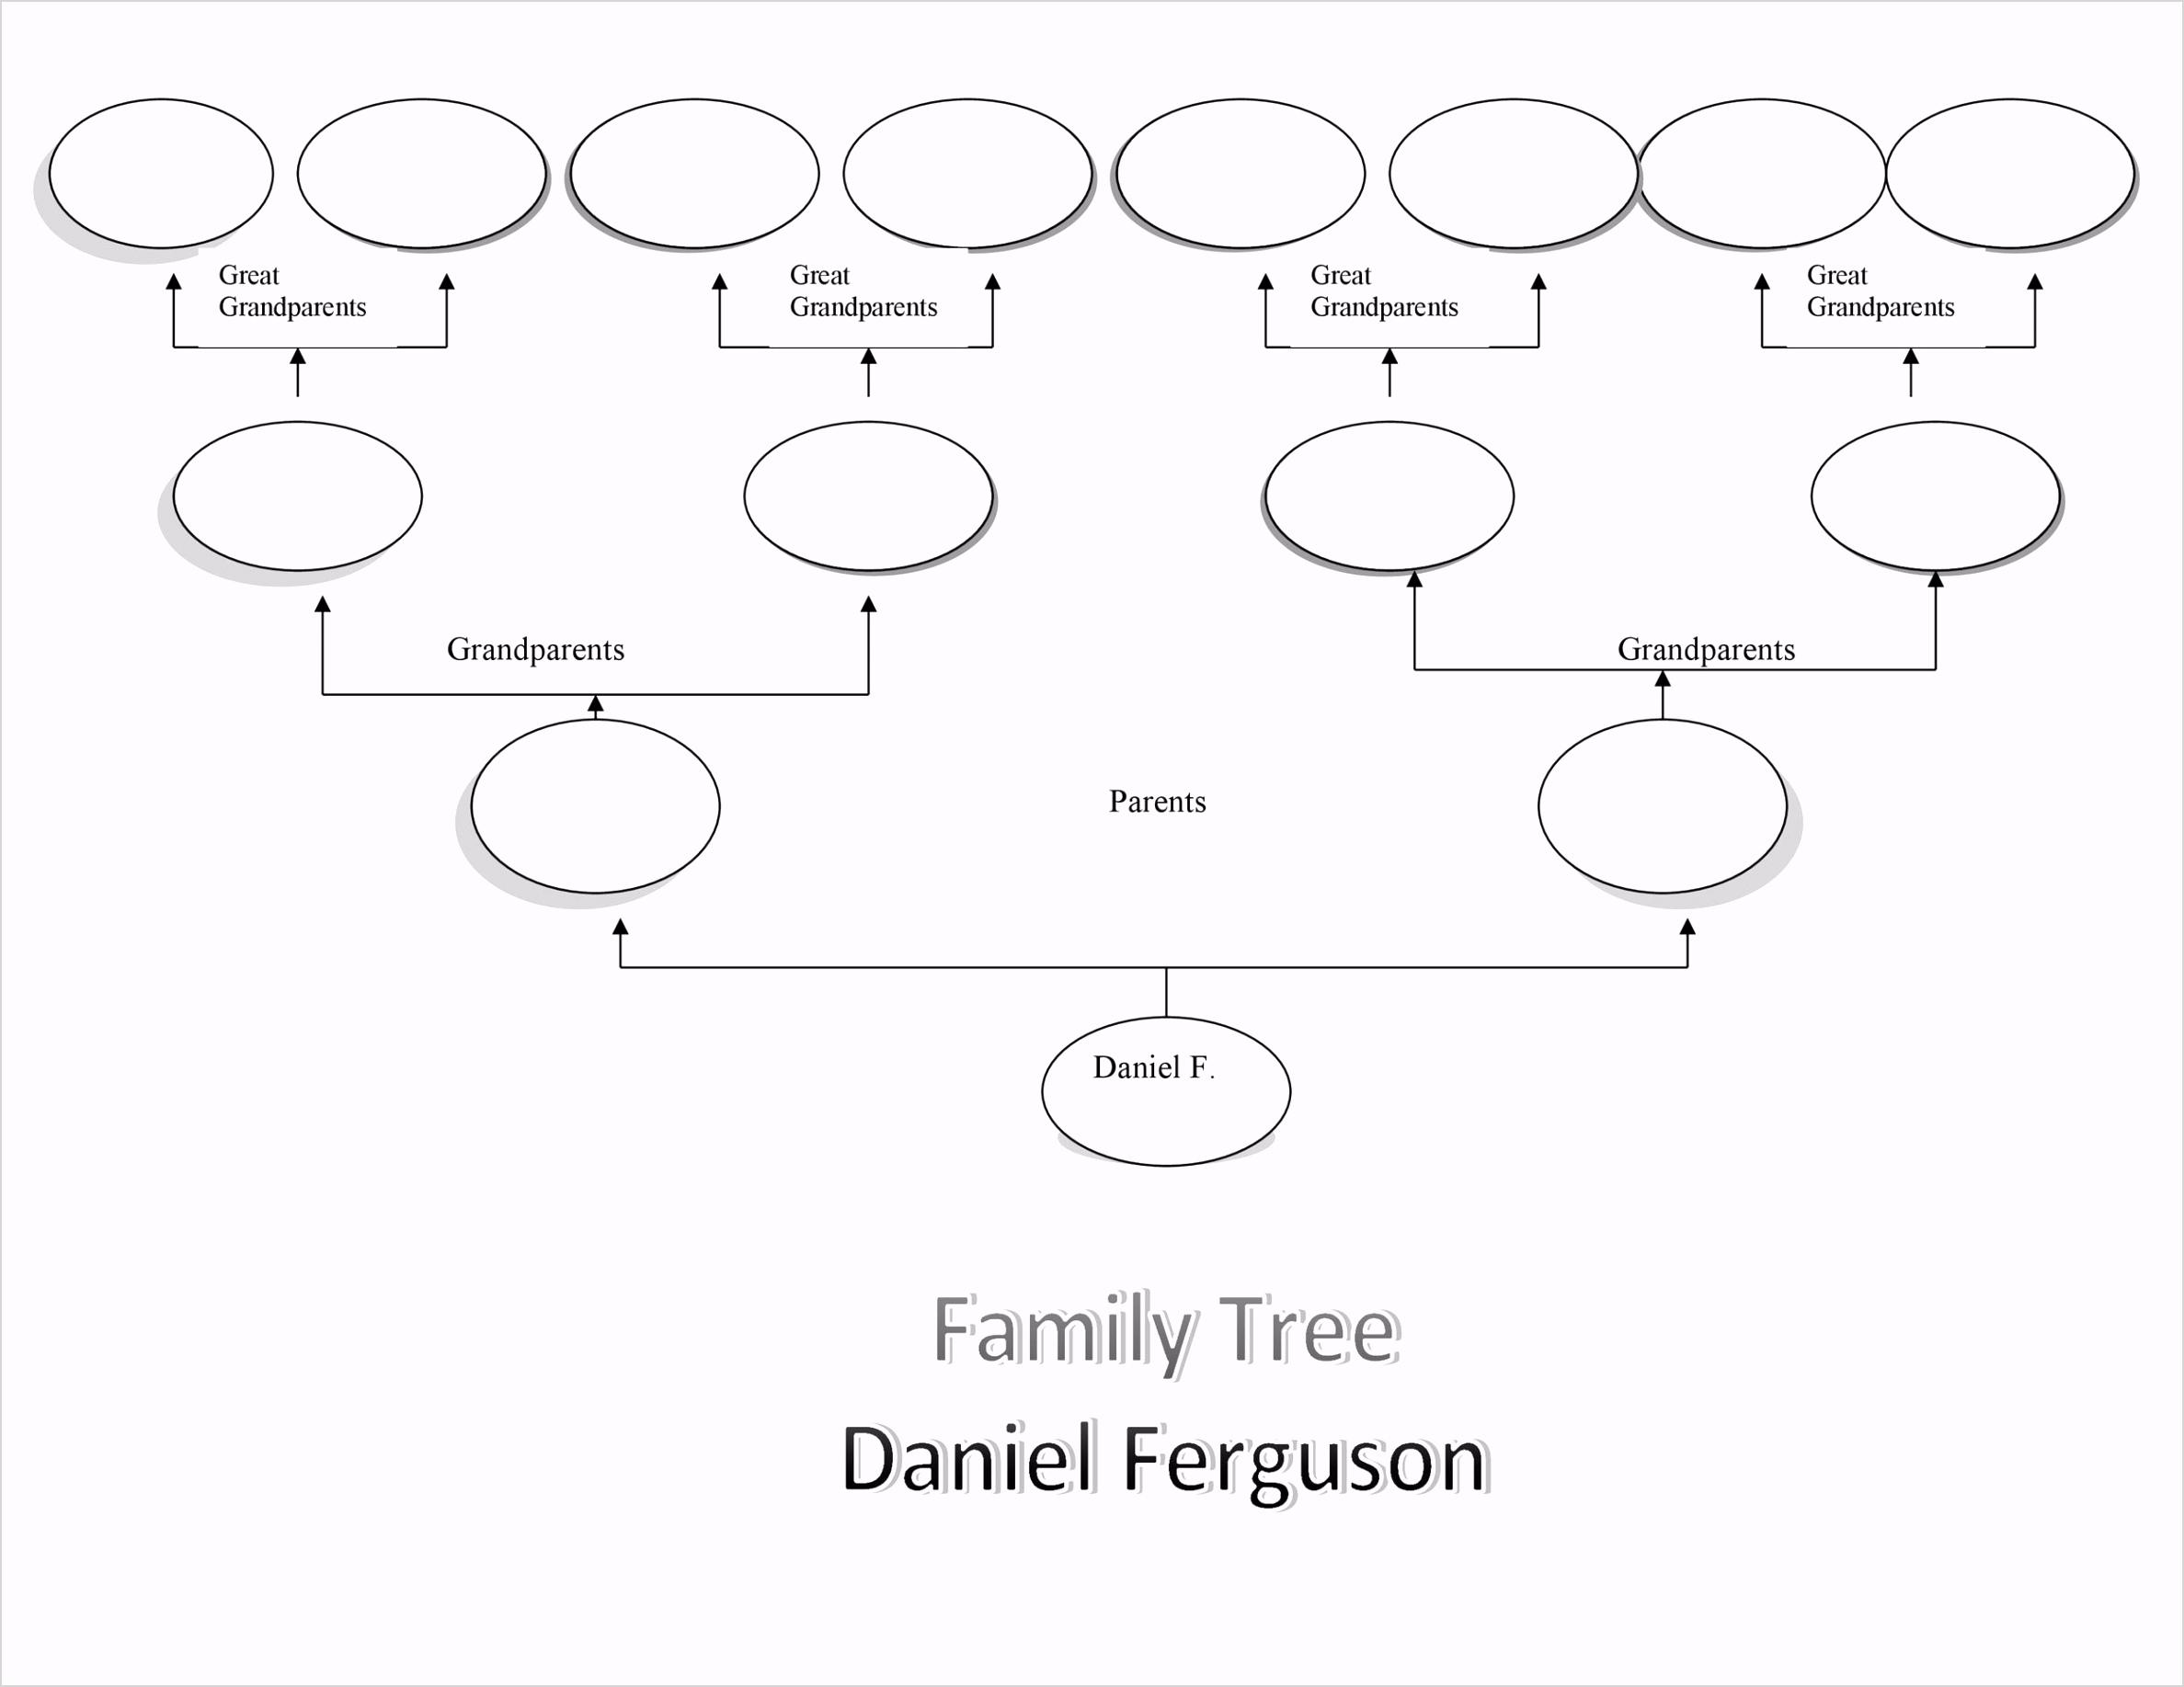 Ancestry Chart Template 15677 I2i2u 41 Free Family Tree Templates Word Excel Pdf Templatelab Ueu@[o H G T E N B E B T D A S D F G H J K L O I U Y T R M N W C G T Y U X Z C C X Z A S Q W D D A J H H U I K J T U F I E F D W H I O C P L O K I U J M N H Y T R F V C D E W S X Z A Q S Z X C V B N M N B V C C X Z A Q W E E D C V T